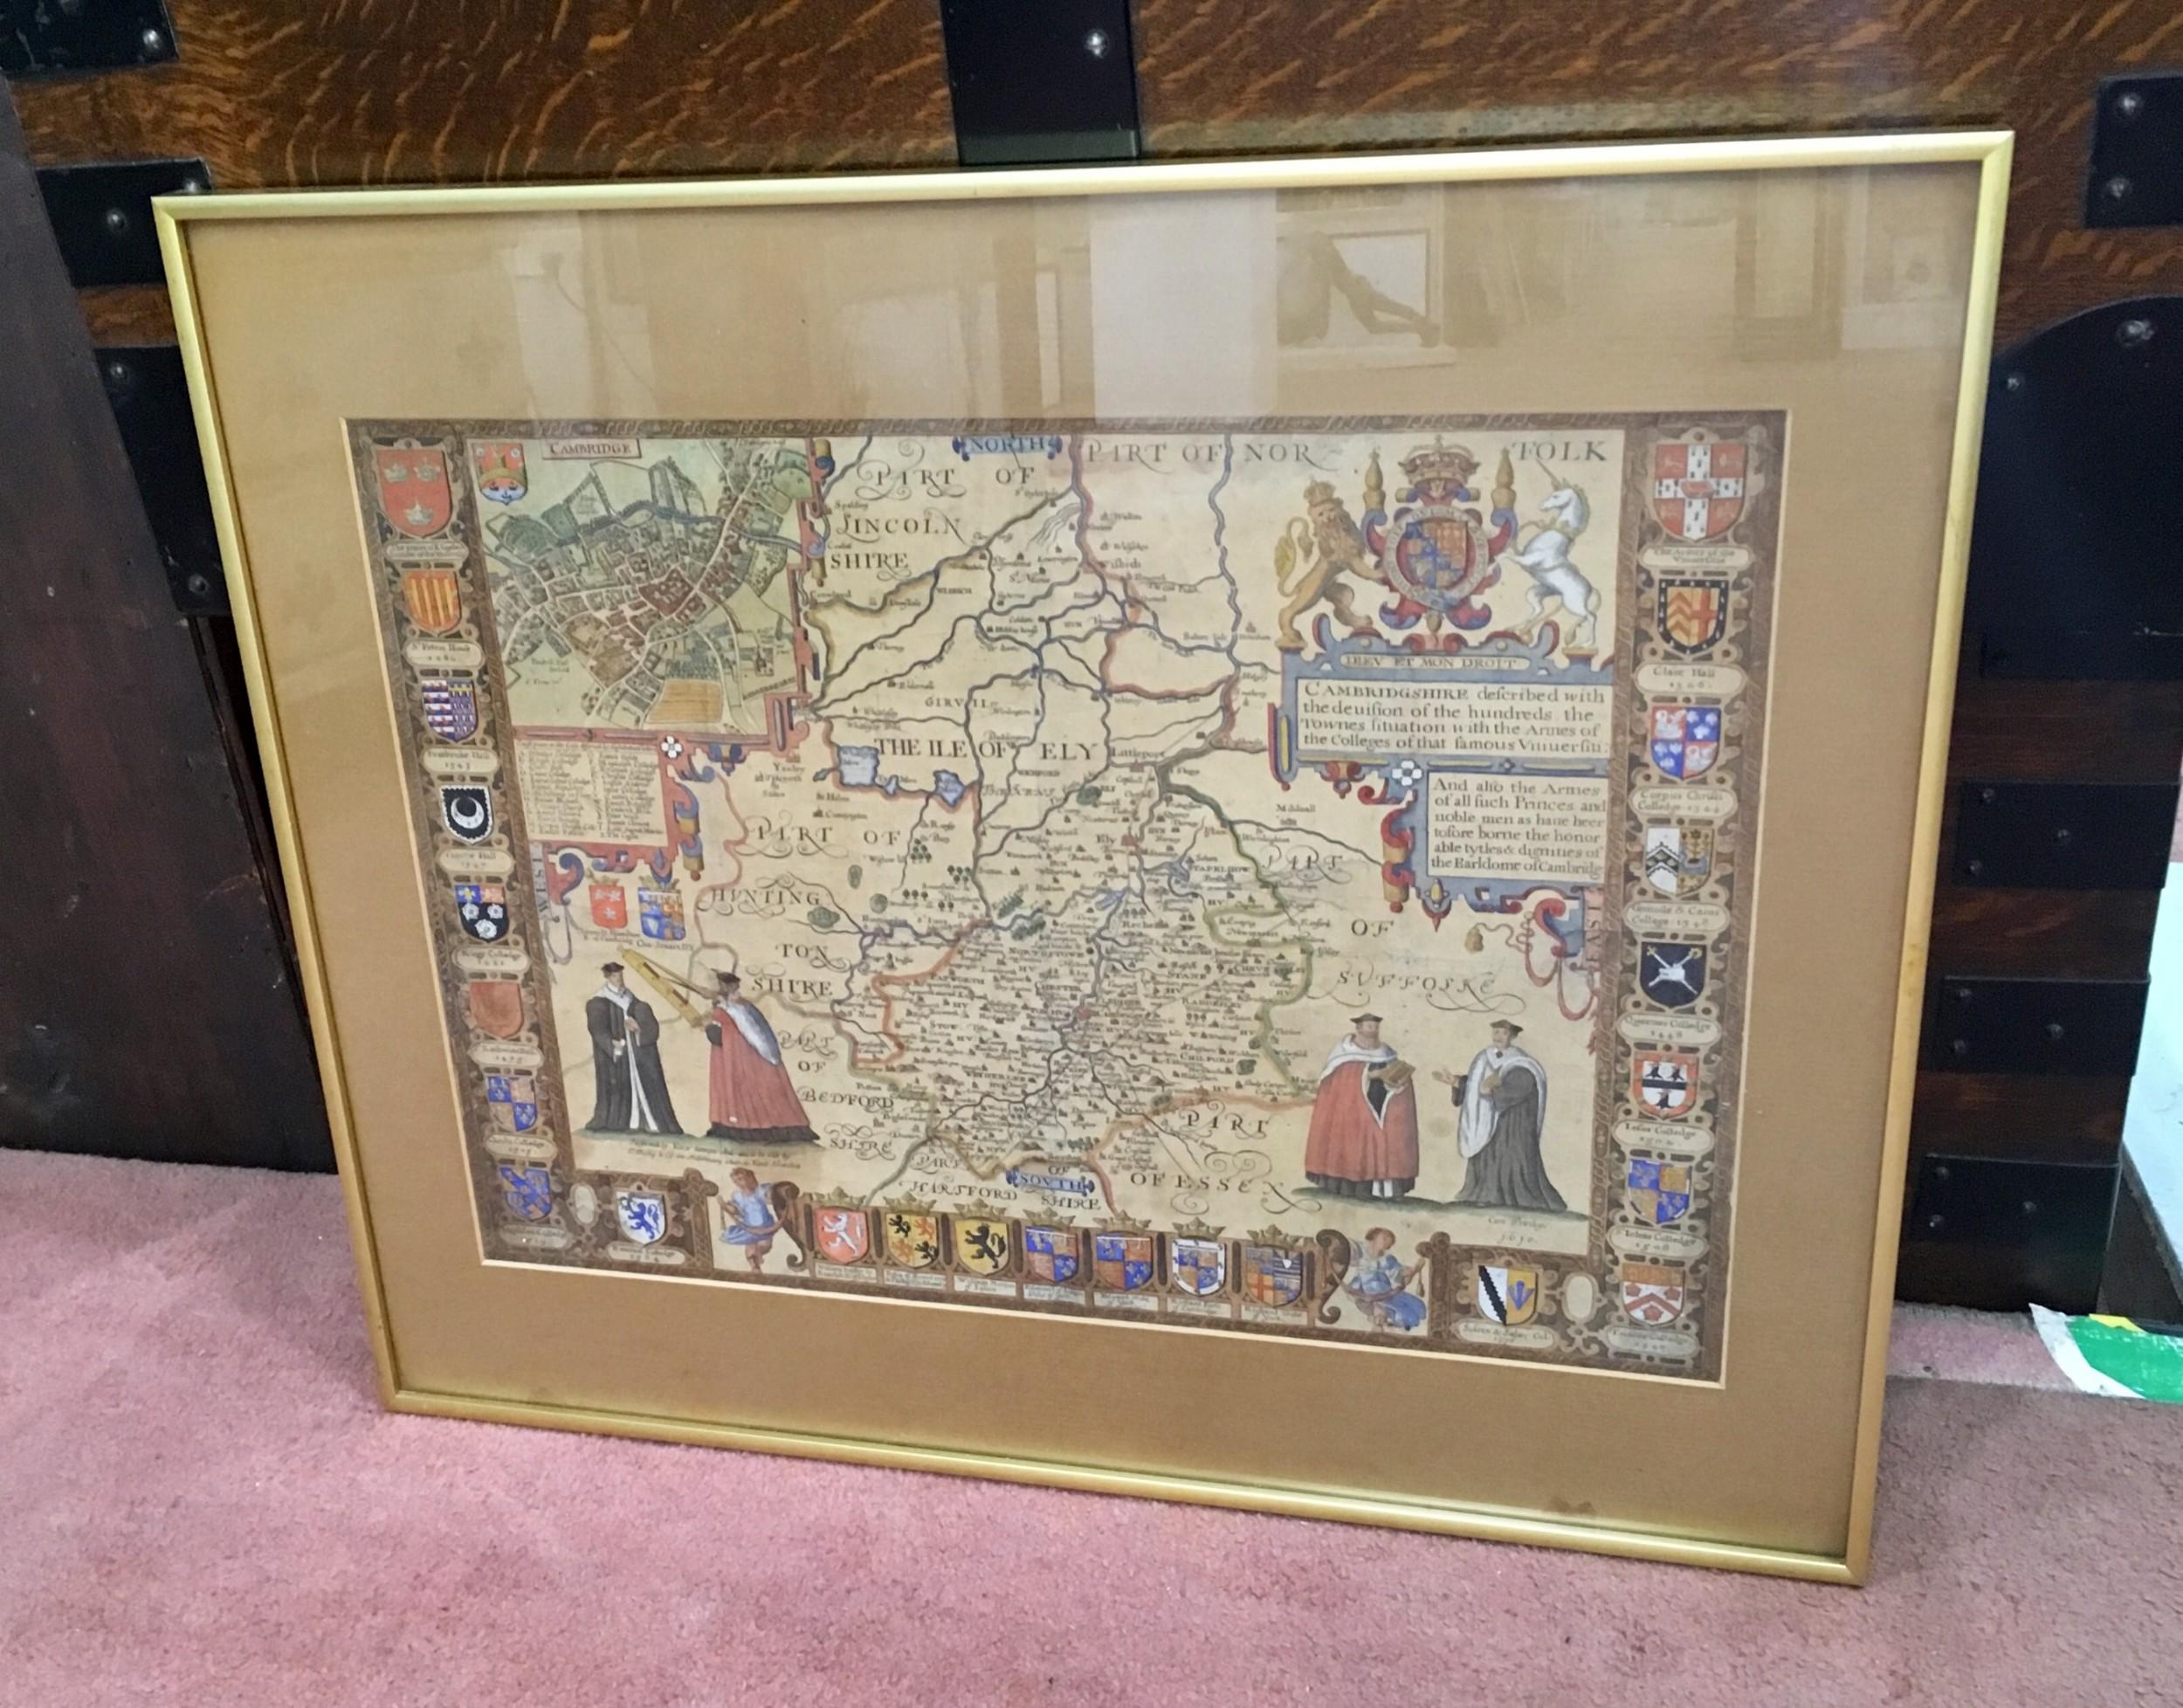 1610 map of cambridge by john speed